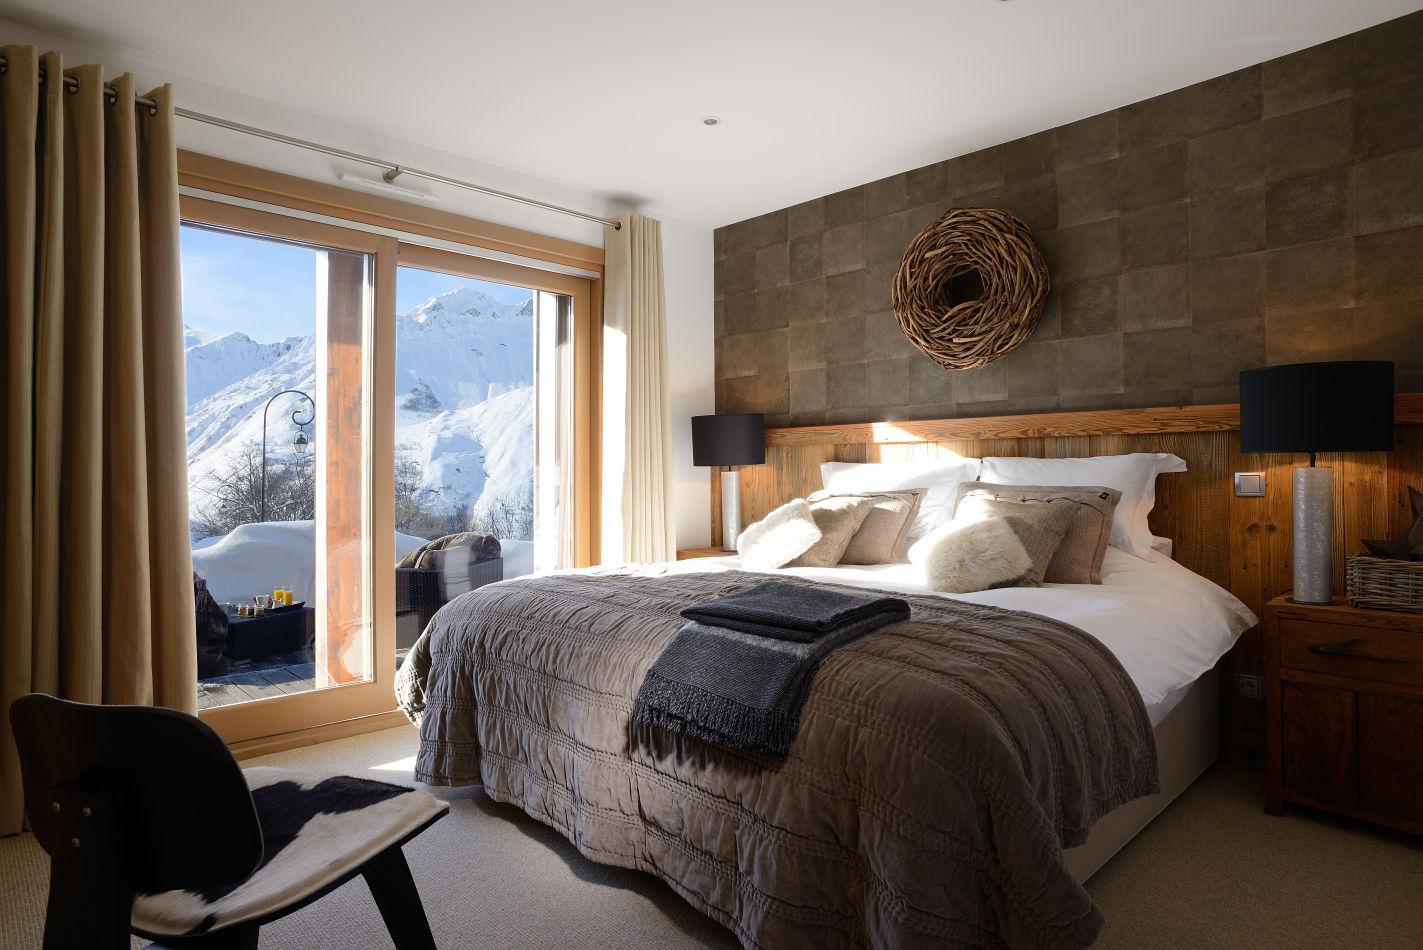 7-bedroom-3-family-suite-with-twin-or-double-bed-separate-triple-bunk-bedroom-en-suite-bathroom